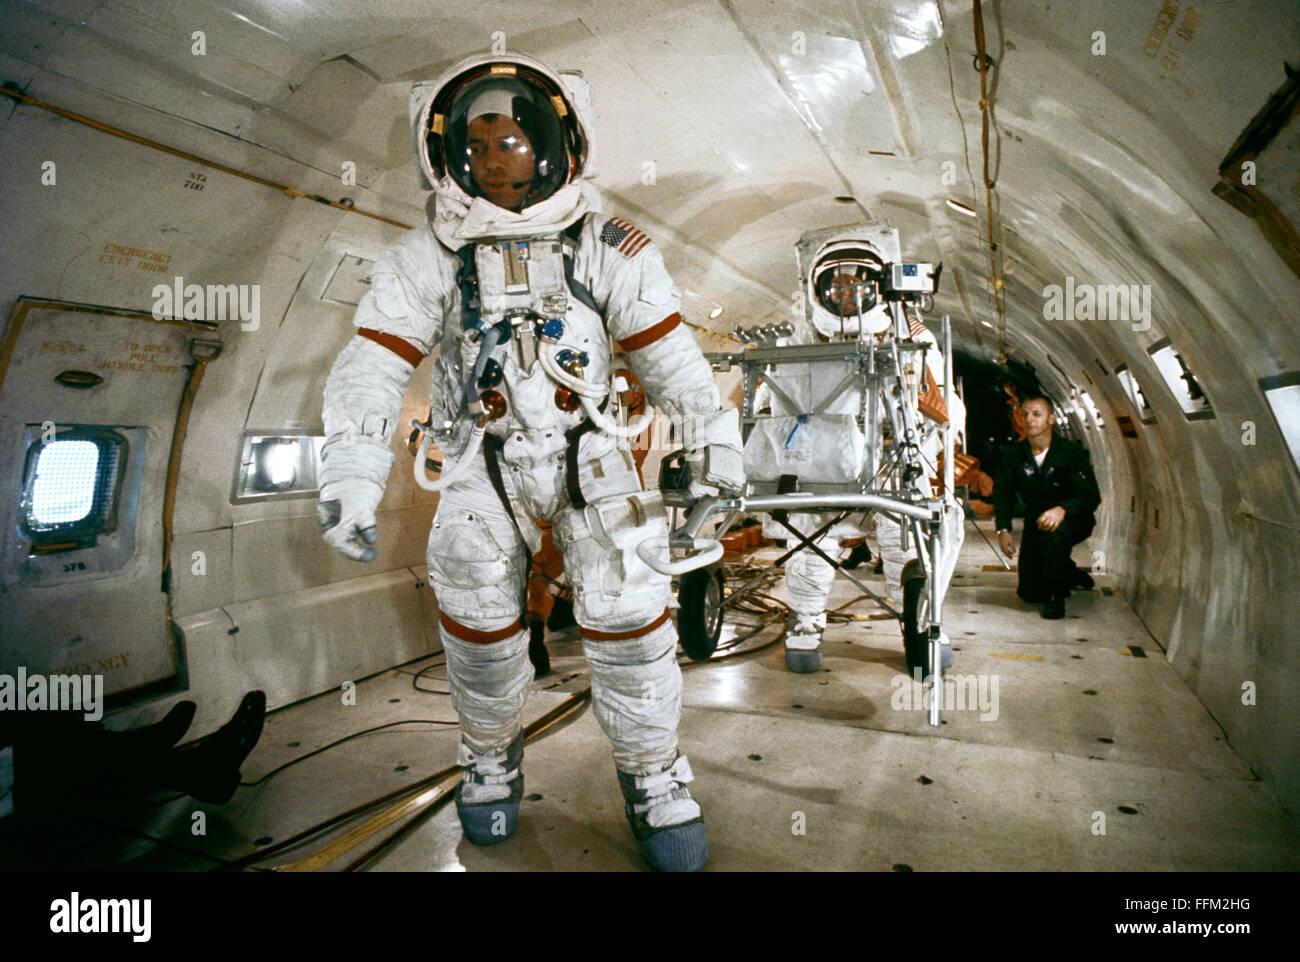 woman astronaut in diaper - 1024×713